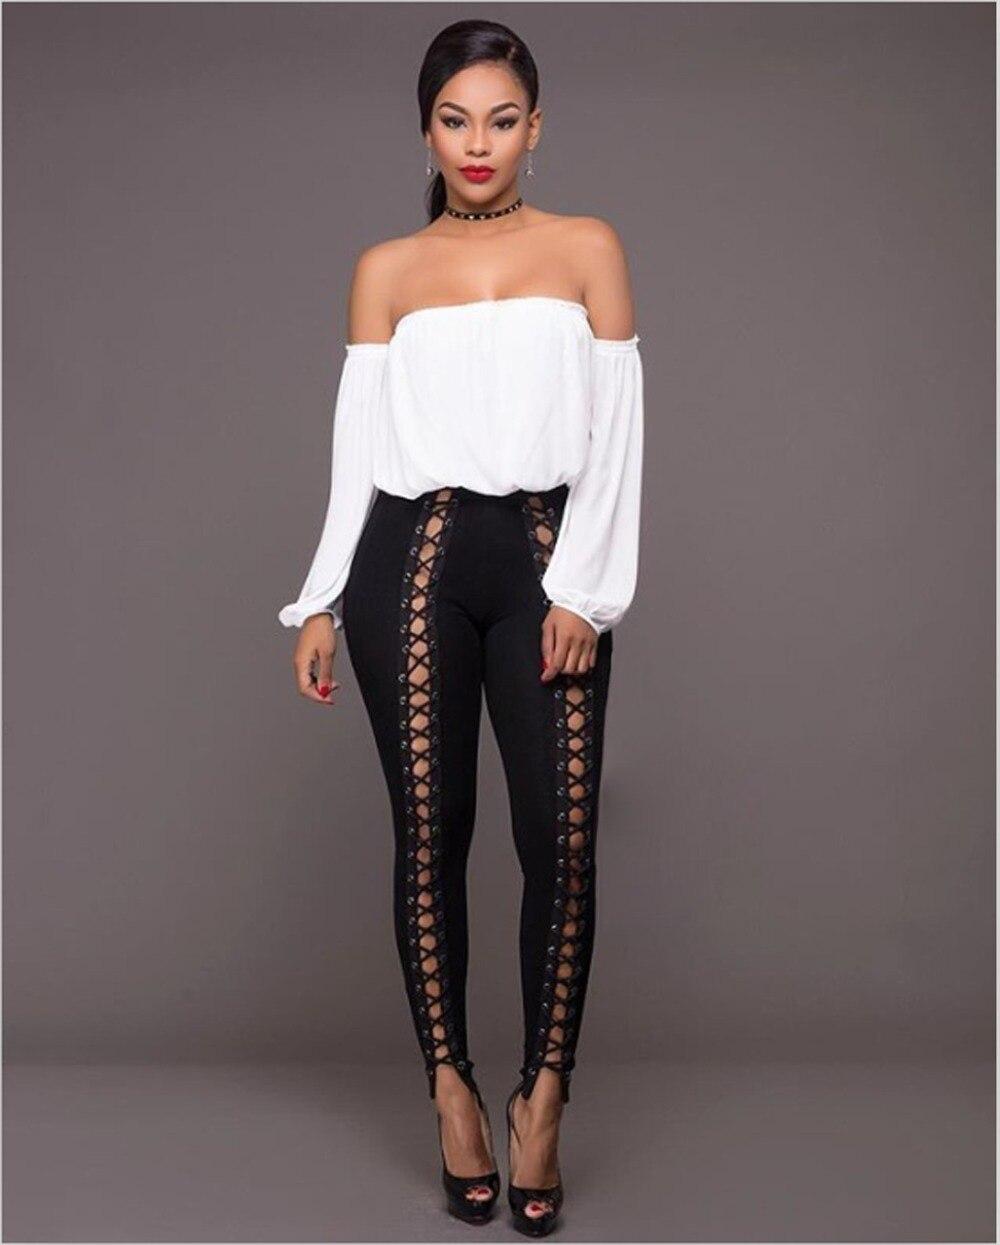 American hot black white bodysuit women legging full length fashion rompers women jumpsuit clubwear 9687